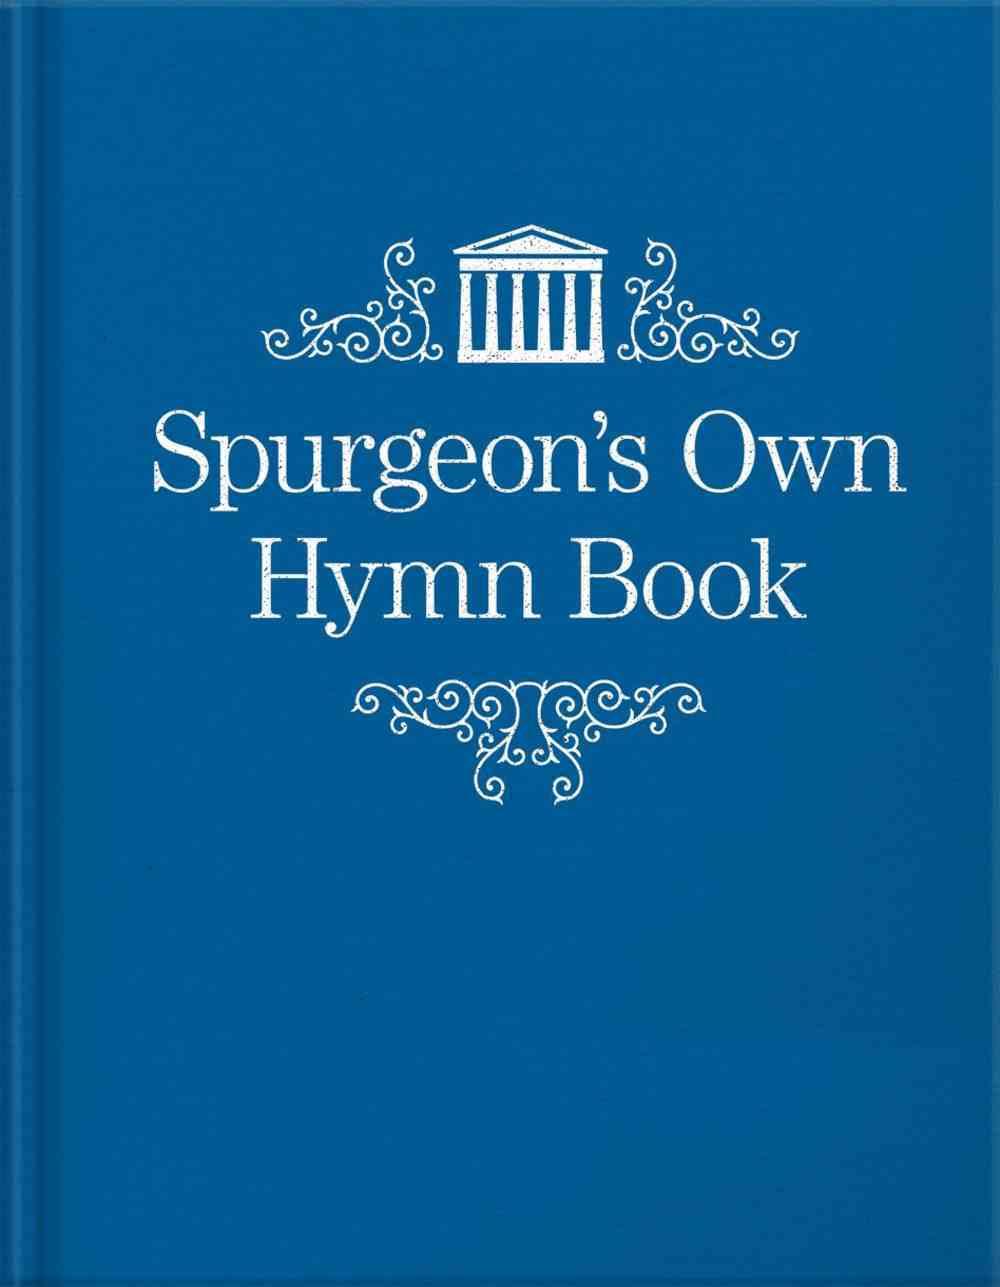 Spurgeon's Own Hymn Book Hardback